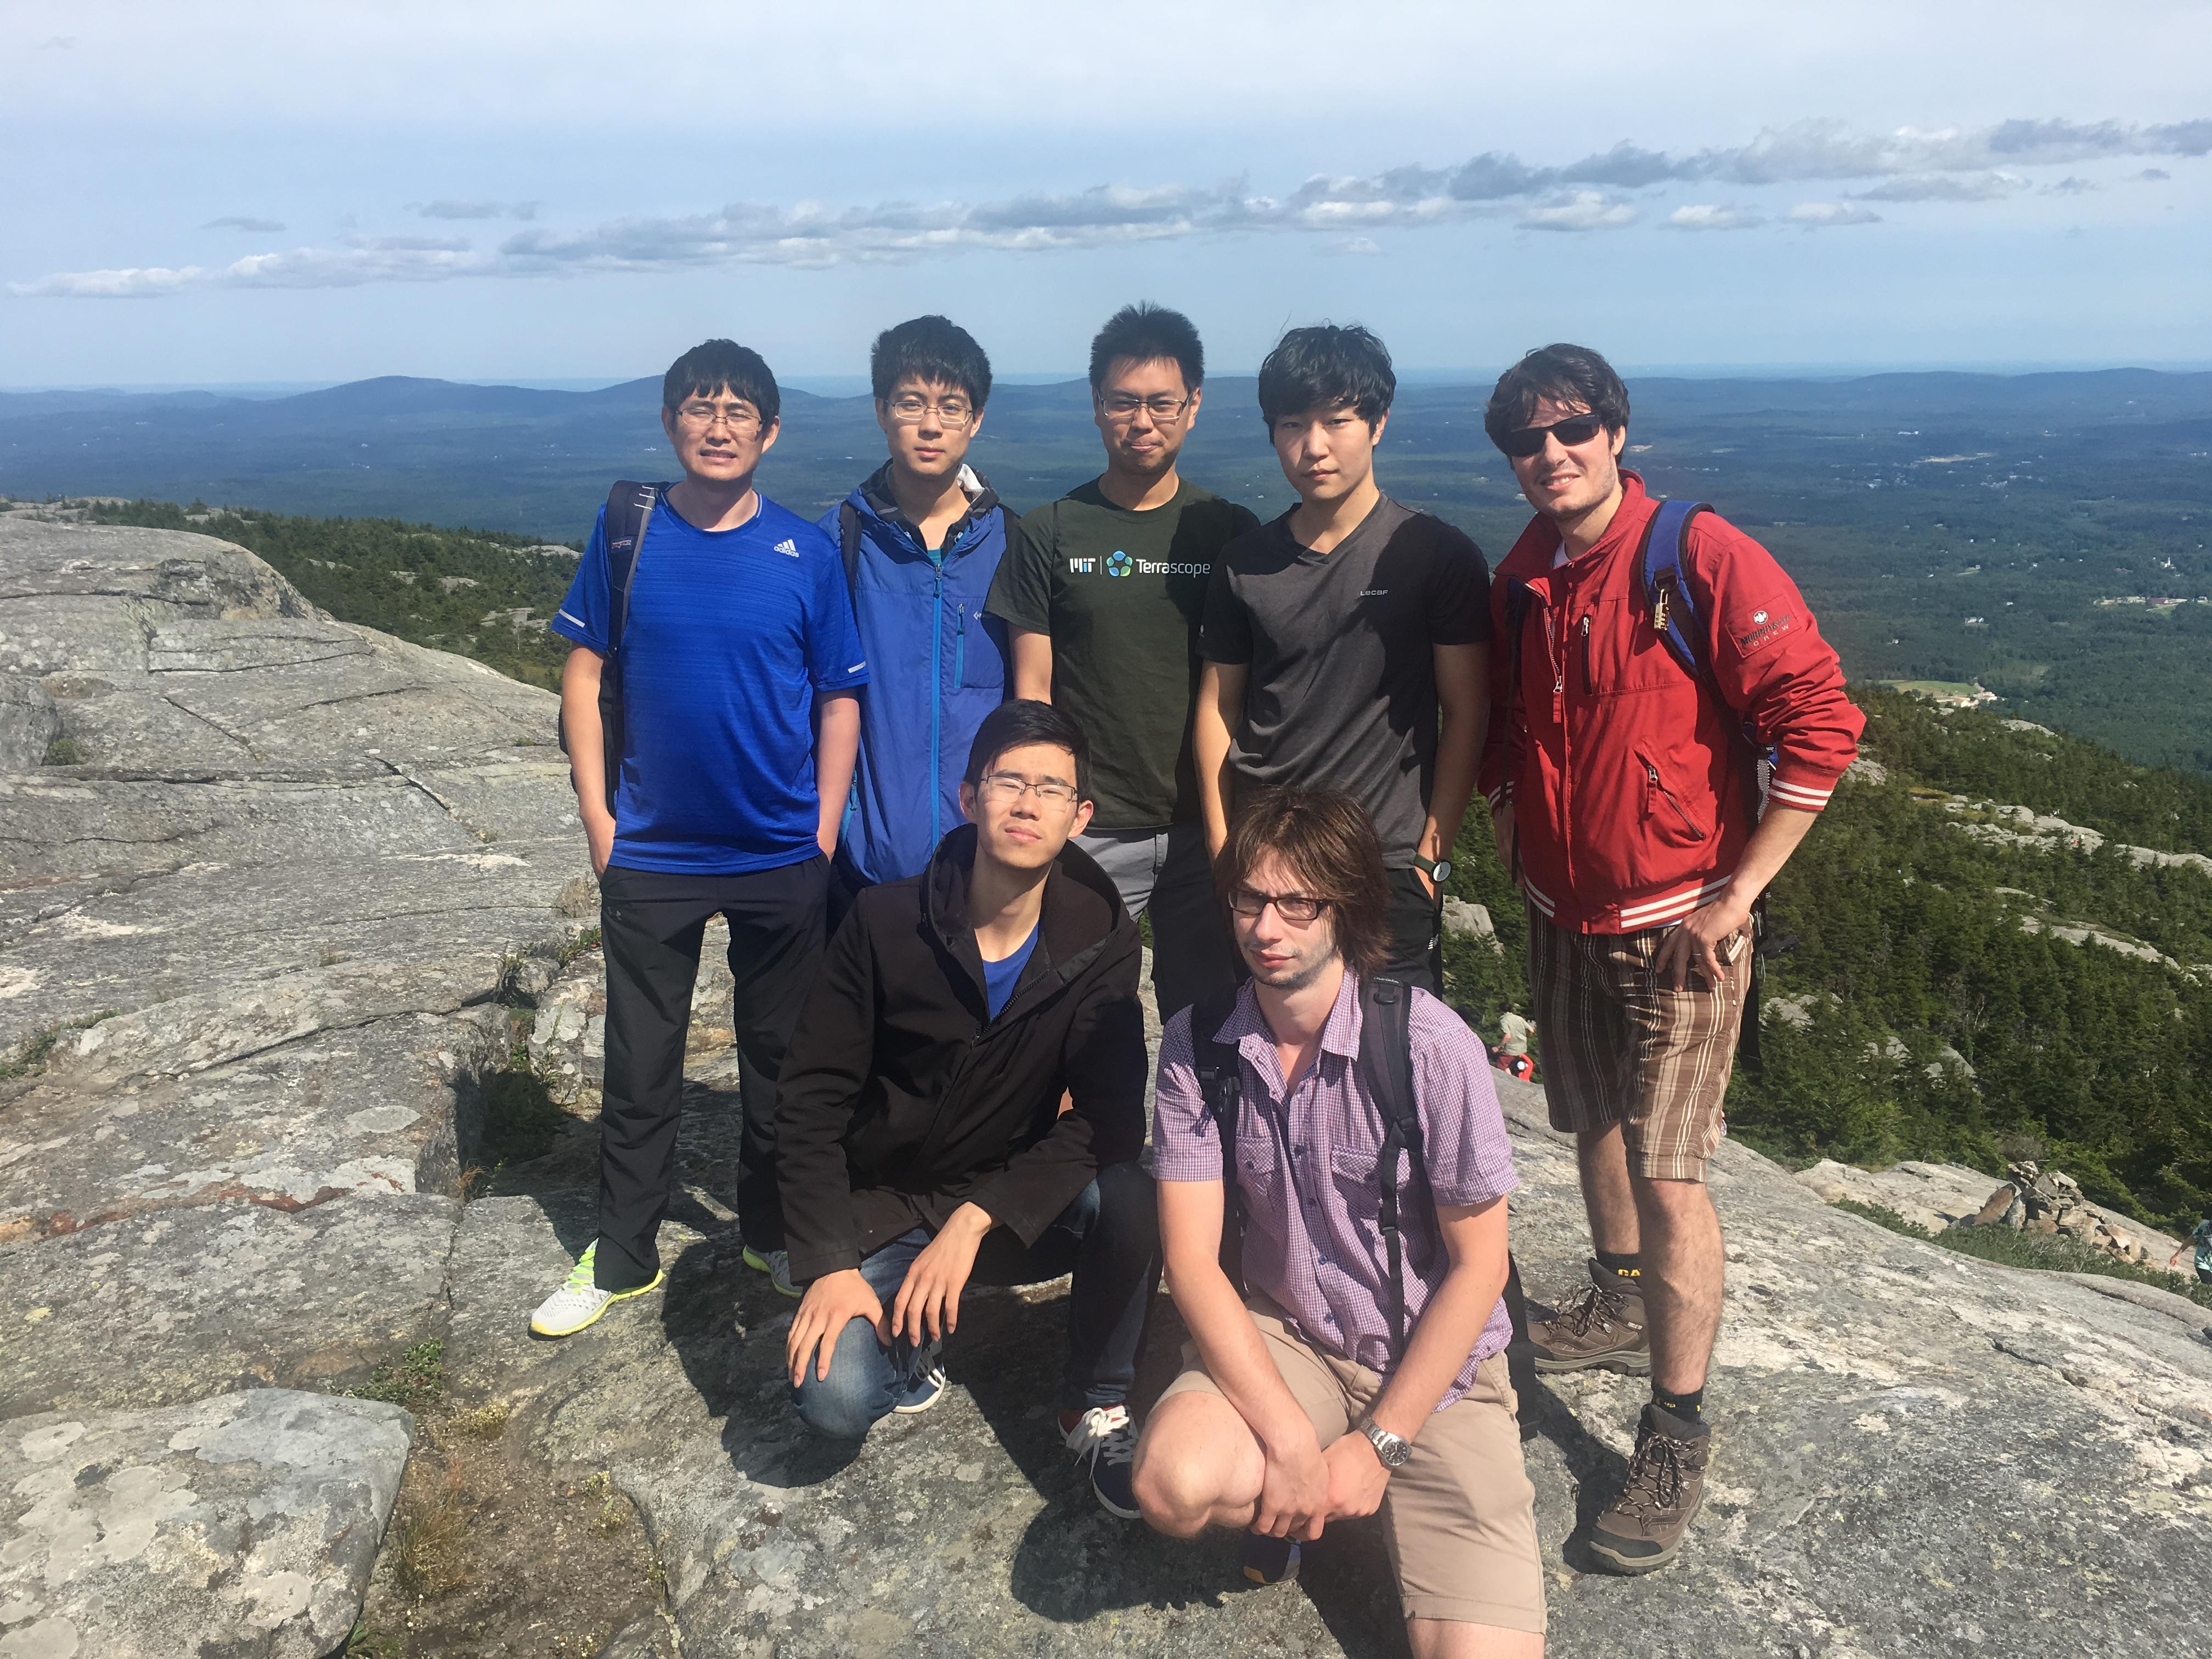 Group hike @ Mount Monadnock (Jul '17)